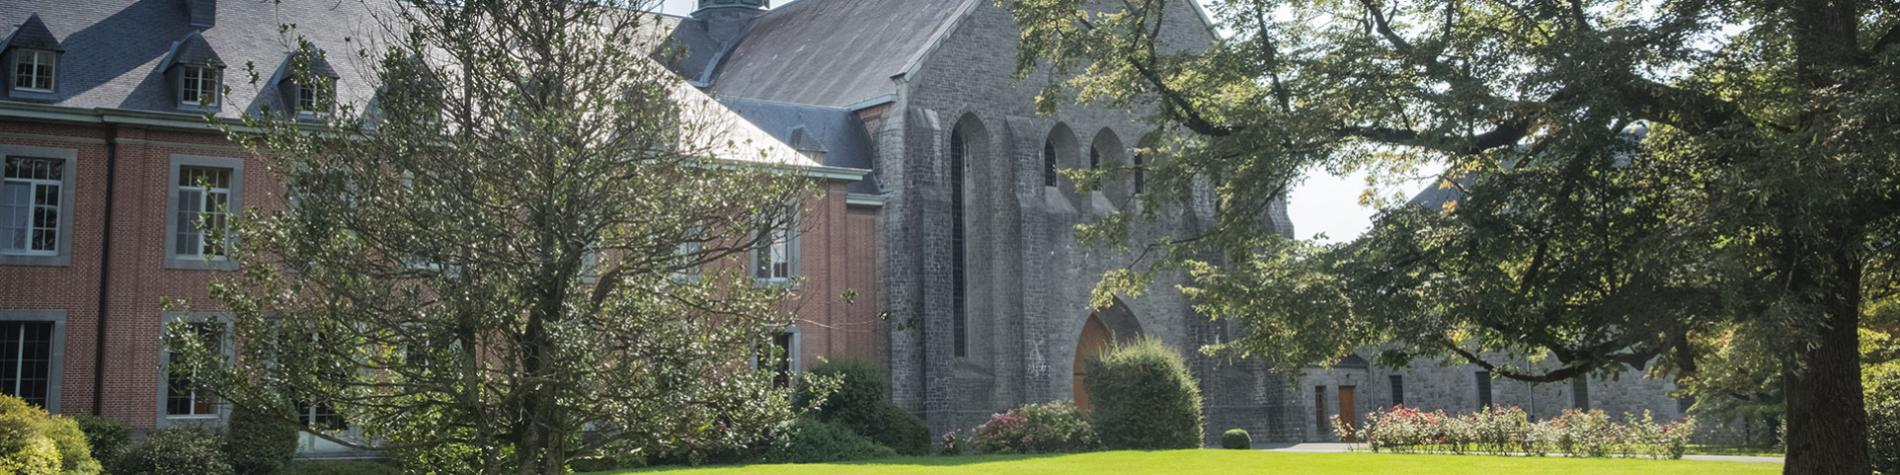 Sentiers - GR - Abbayes - Trappistes - Wallonie - Abbaye de Scourmont